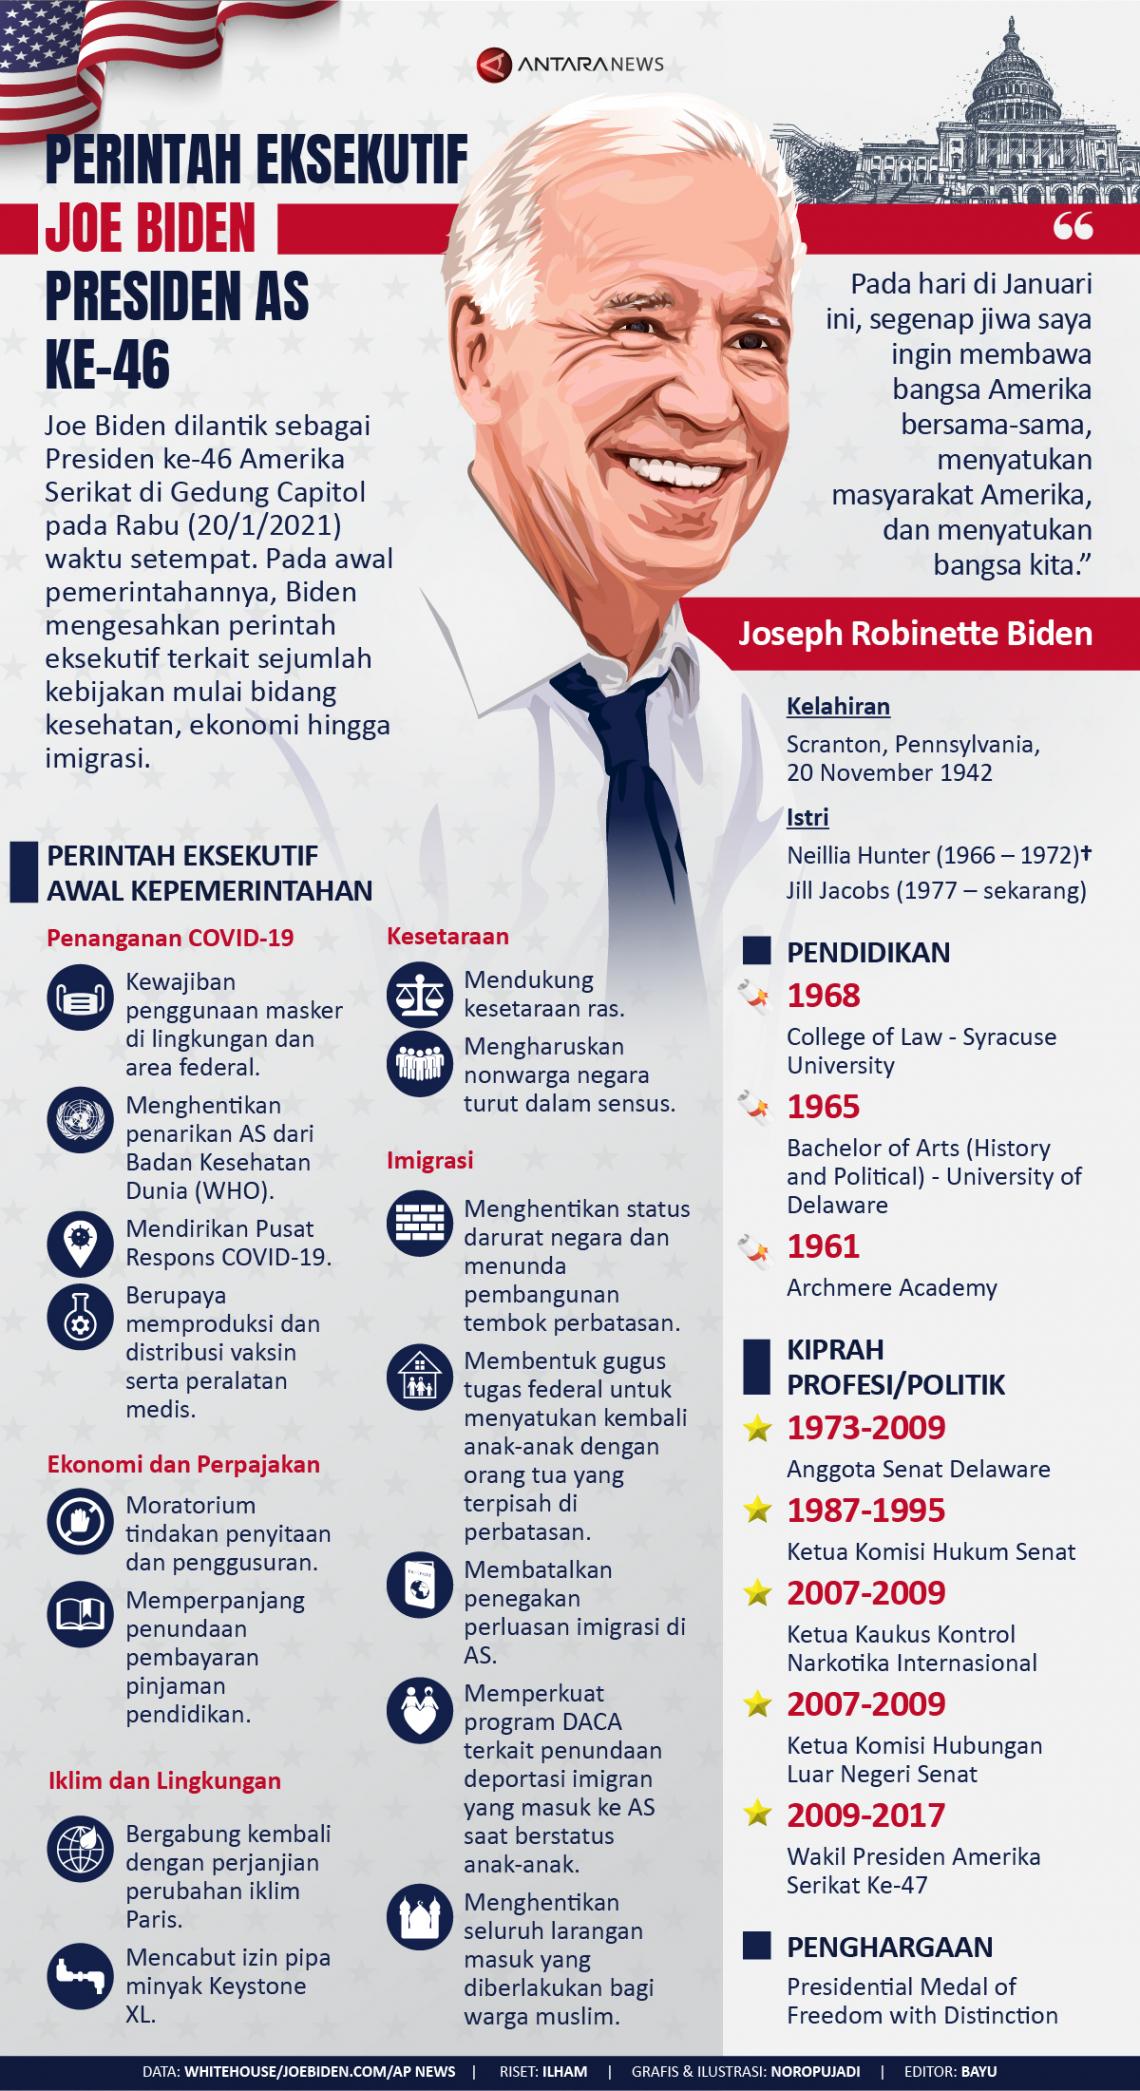 Perintah eksekutif Presiden AS Joe Biden